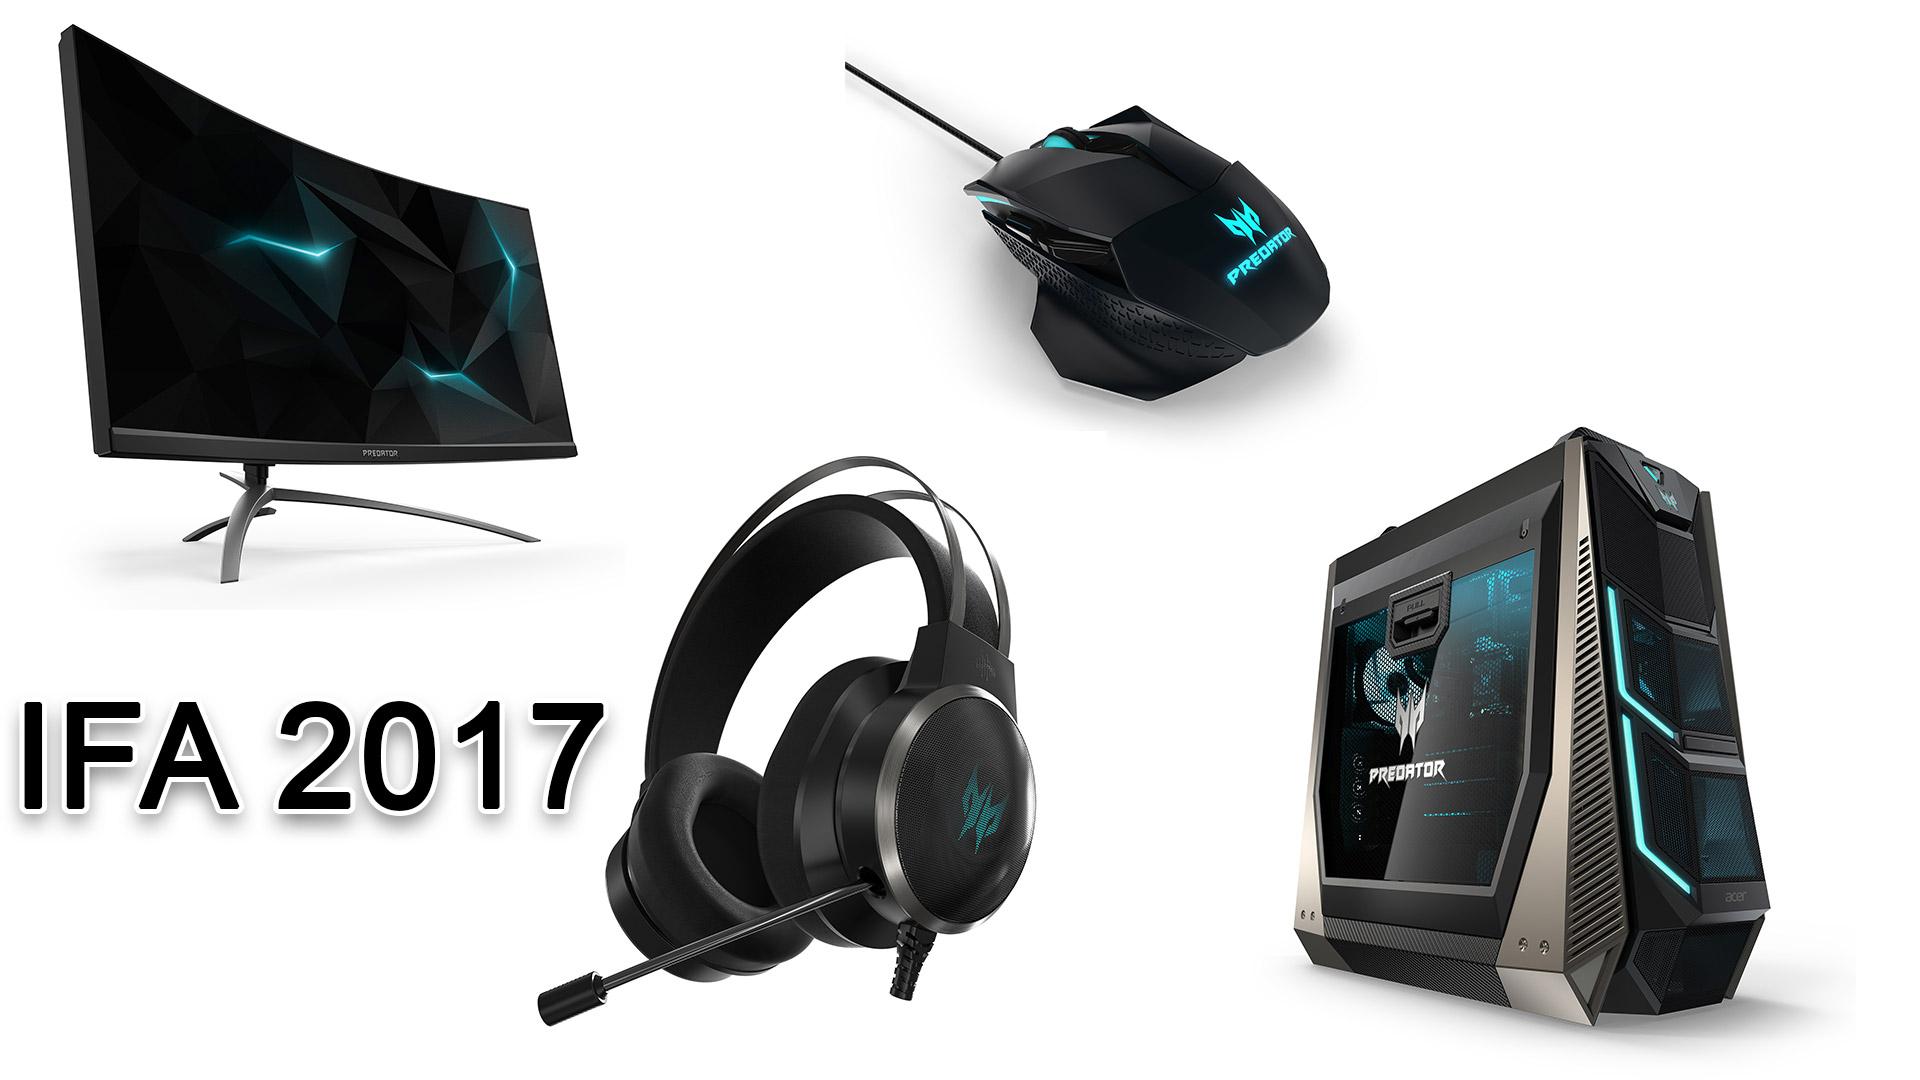 IFA 2017] Acer Announces the Predator Orion 9000 desktop